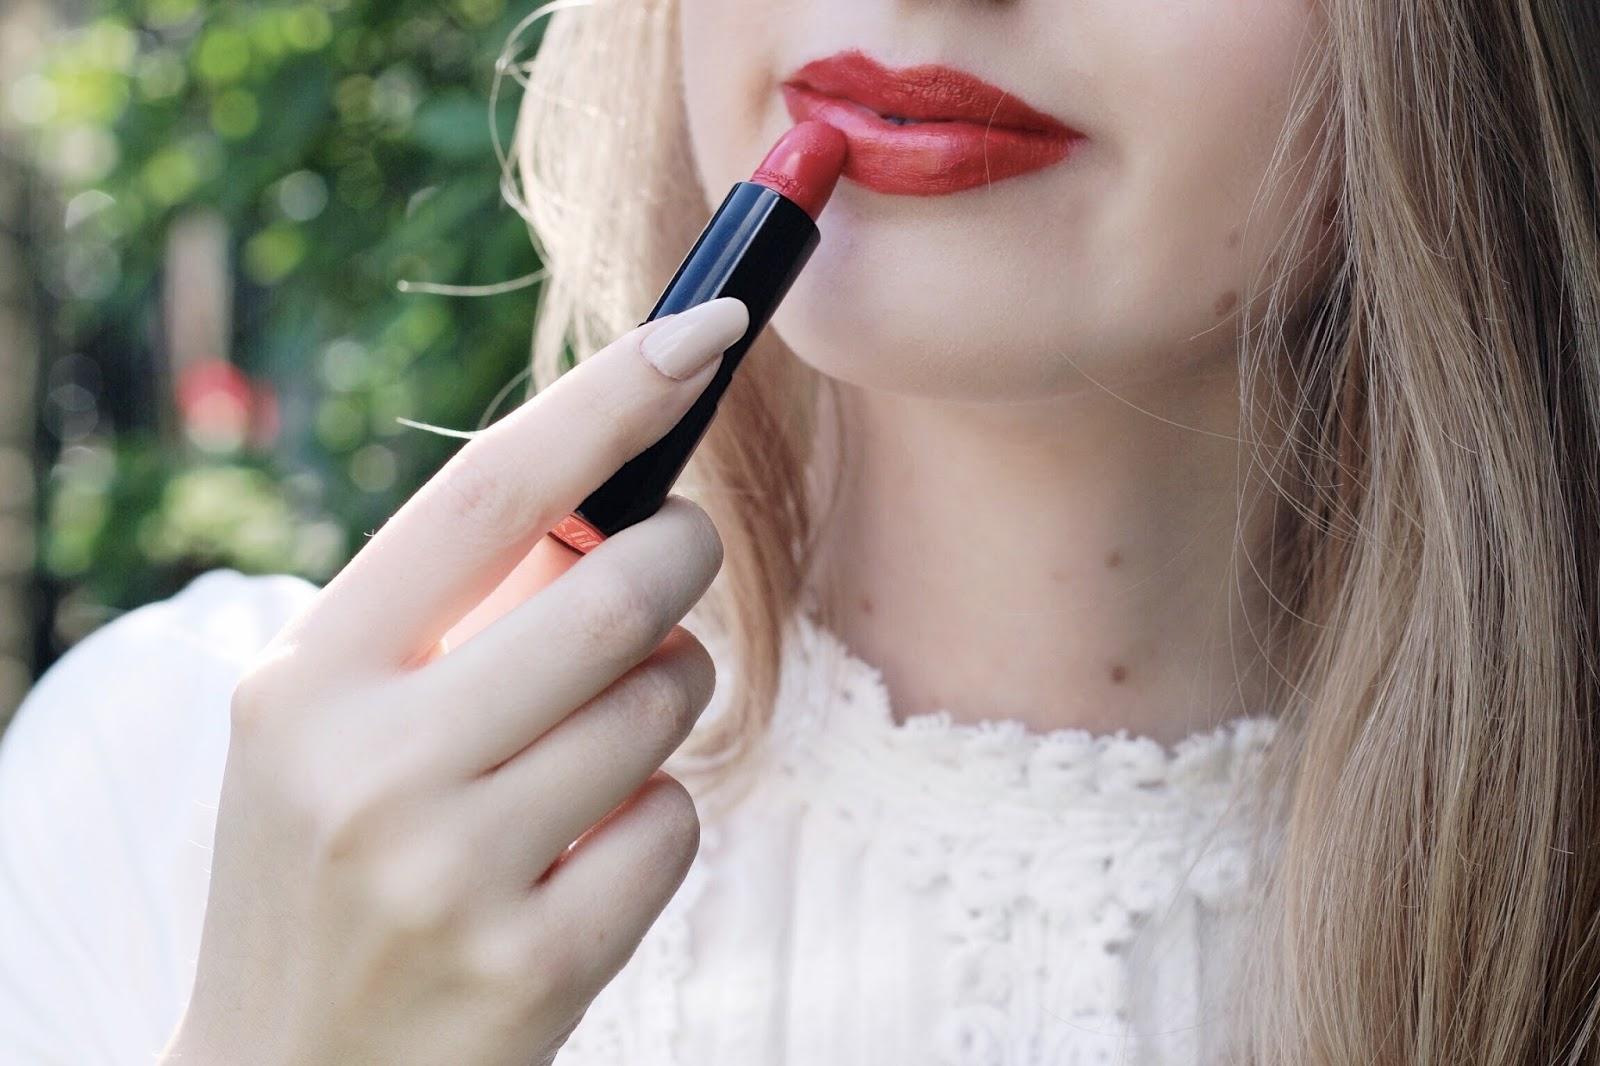 Mii Cosmetics Tropical Daydream Sunburst Lipstick